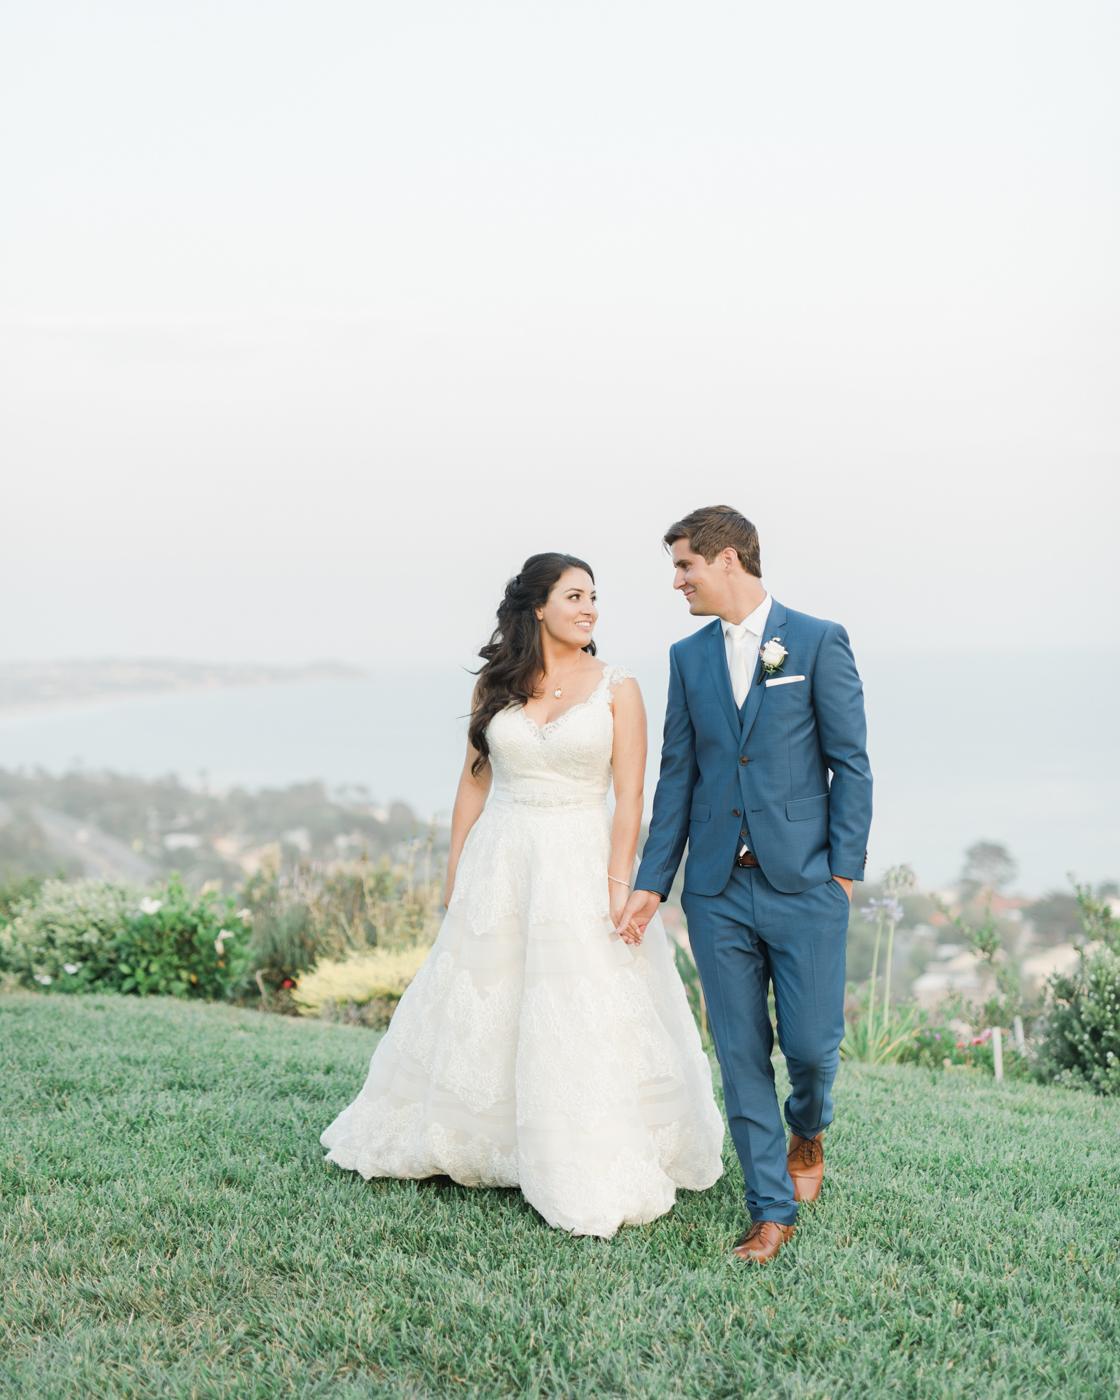 AKP_S&F_Malibu_Wedding_Fine_Art_Photography_Los_Angeles-50.jpg